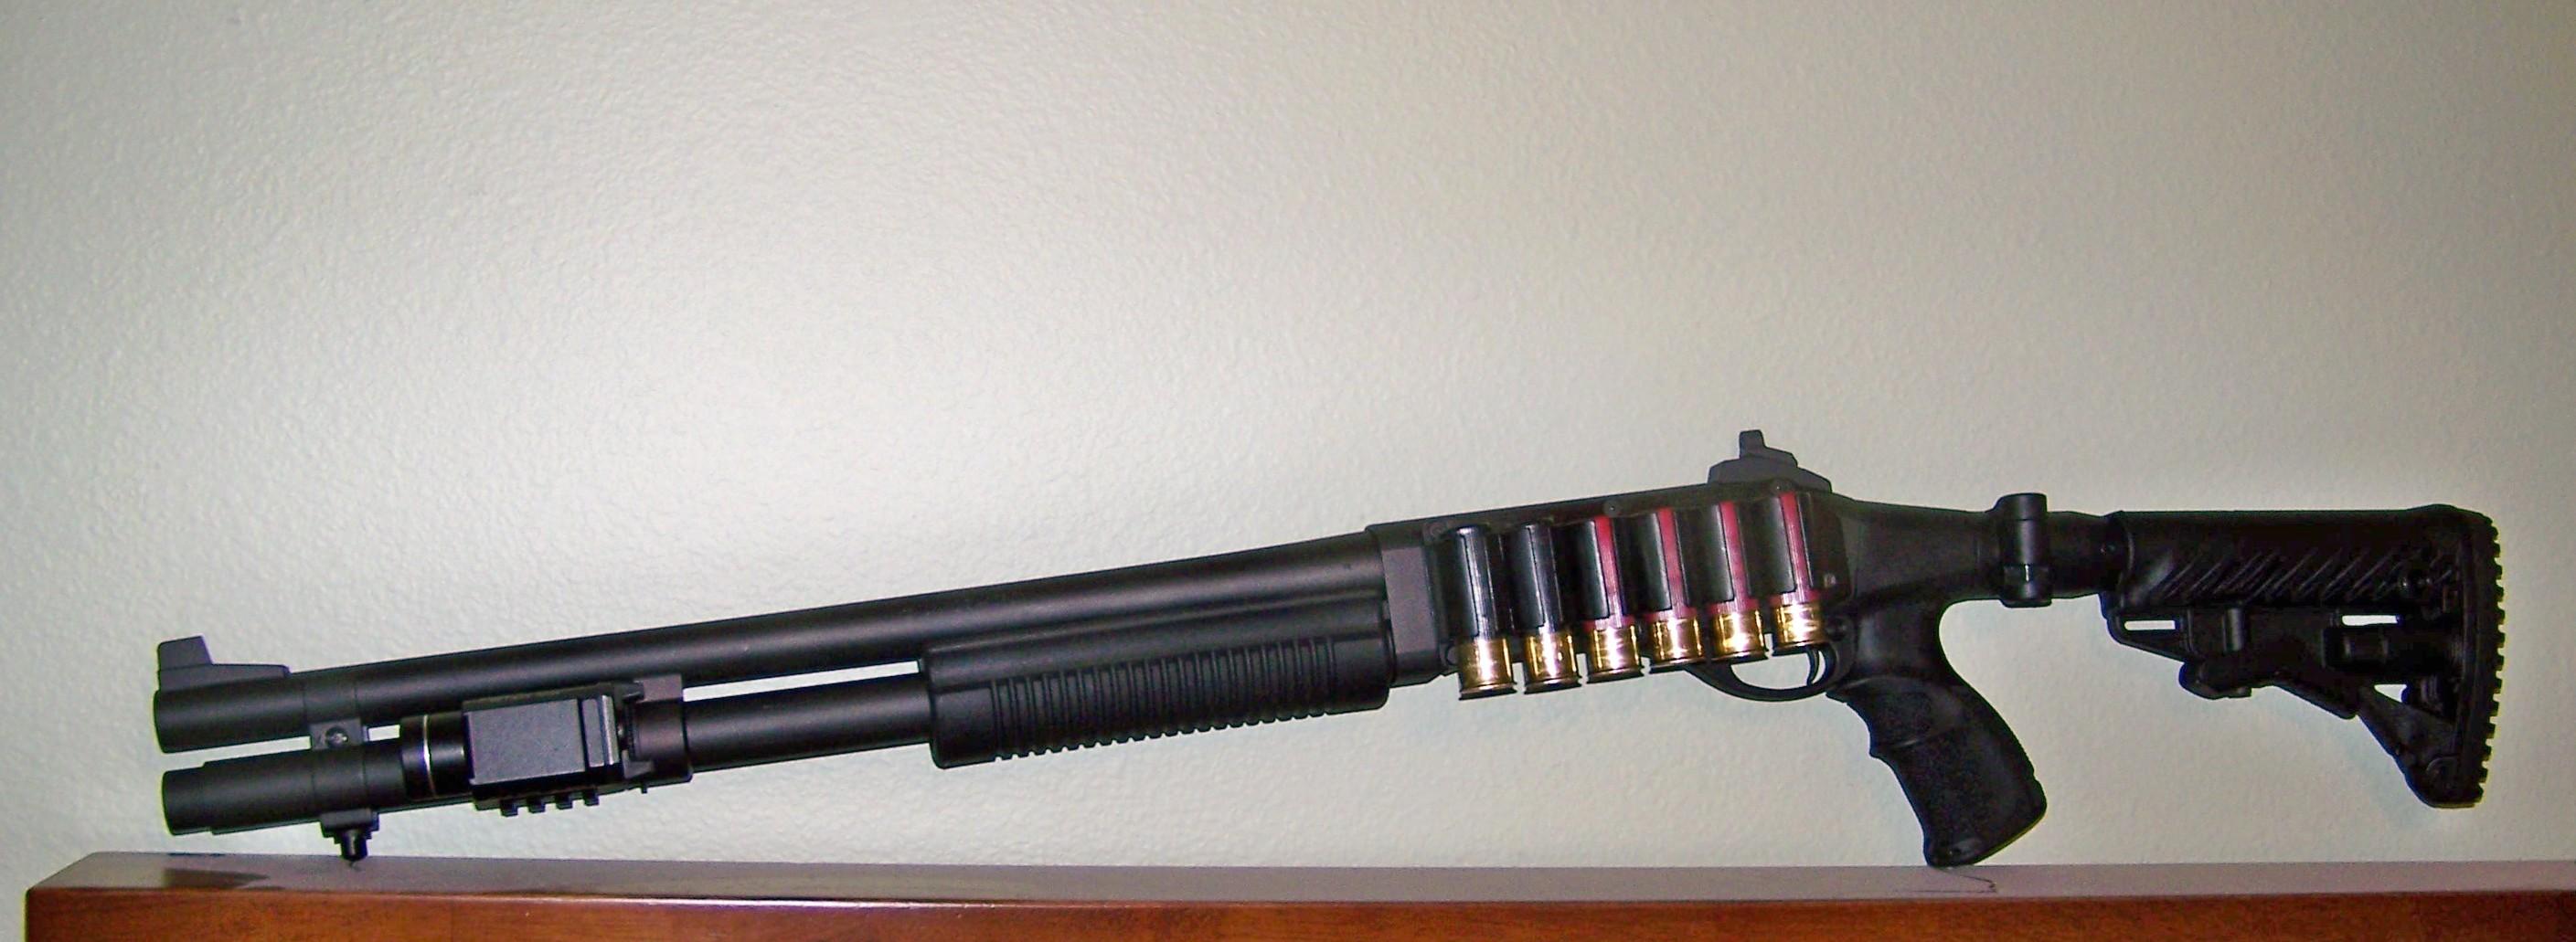 Remington 870 Express, Mako Stock, Wilson Ghost Ring Sights, Streamlight 1